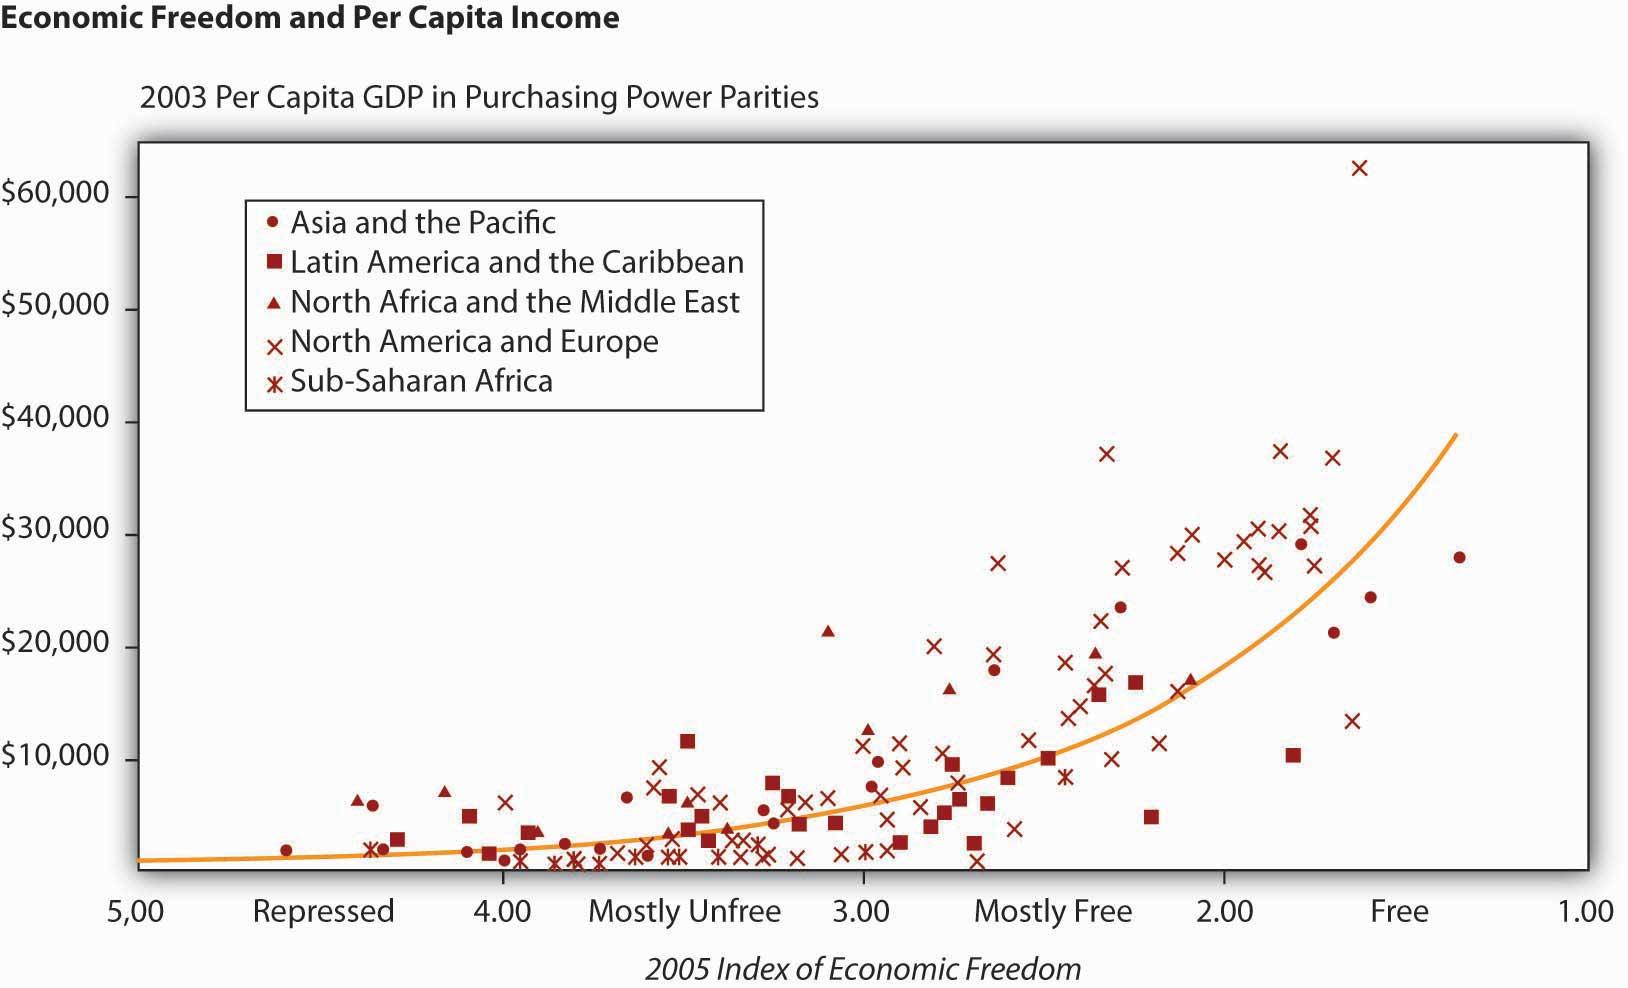 Economic Freedom and Income